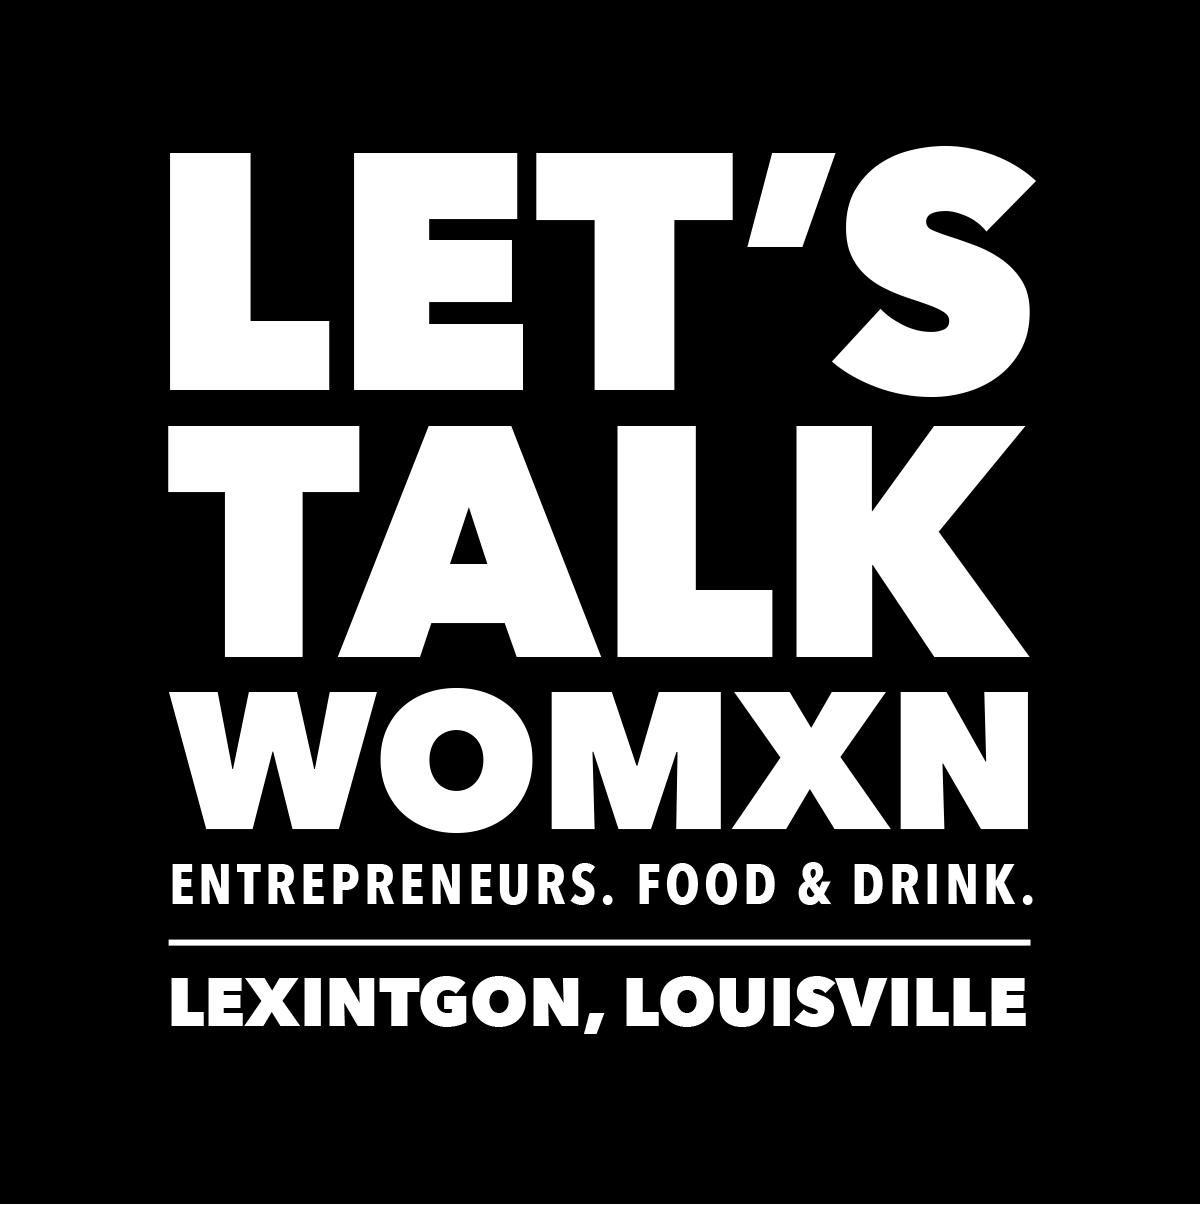 Let's Talk Womxn - Lexington, Louisville